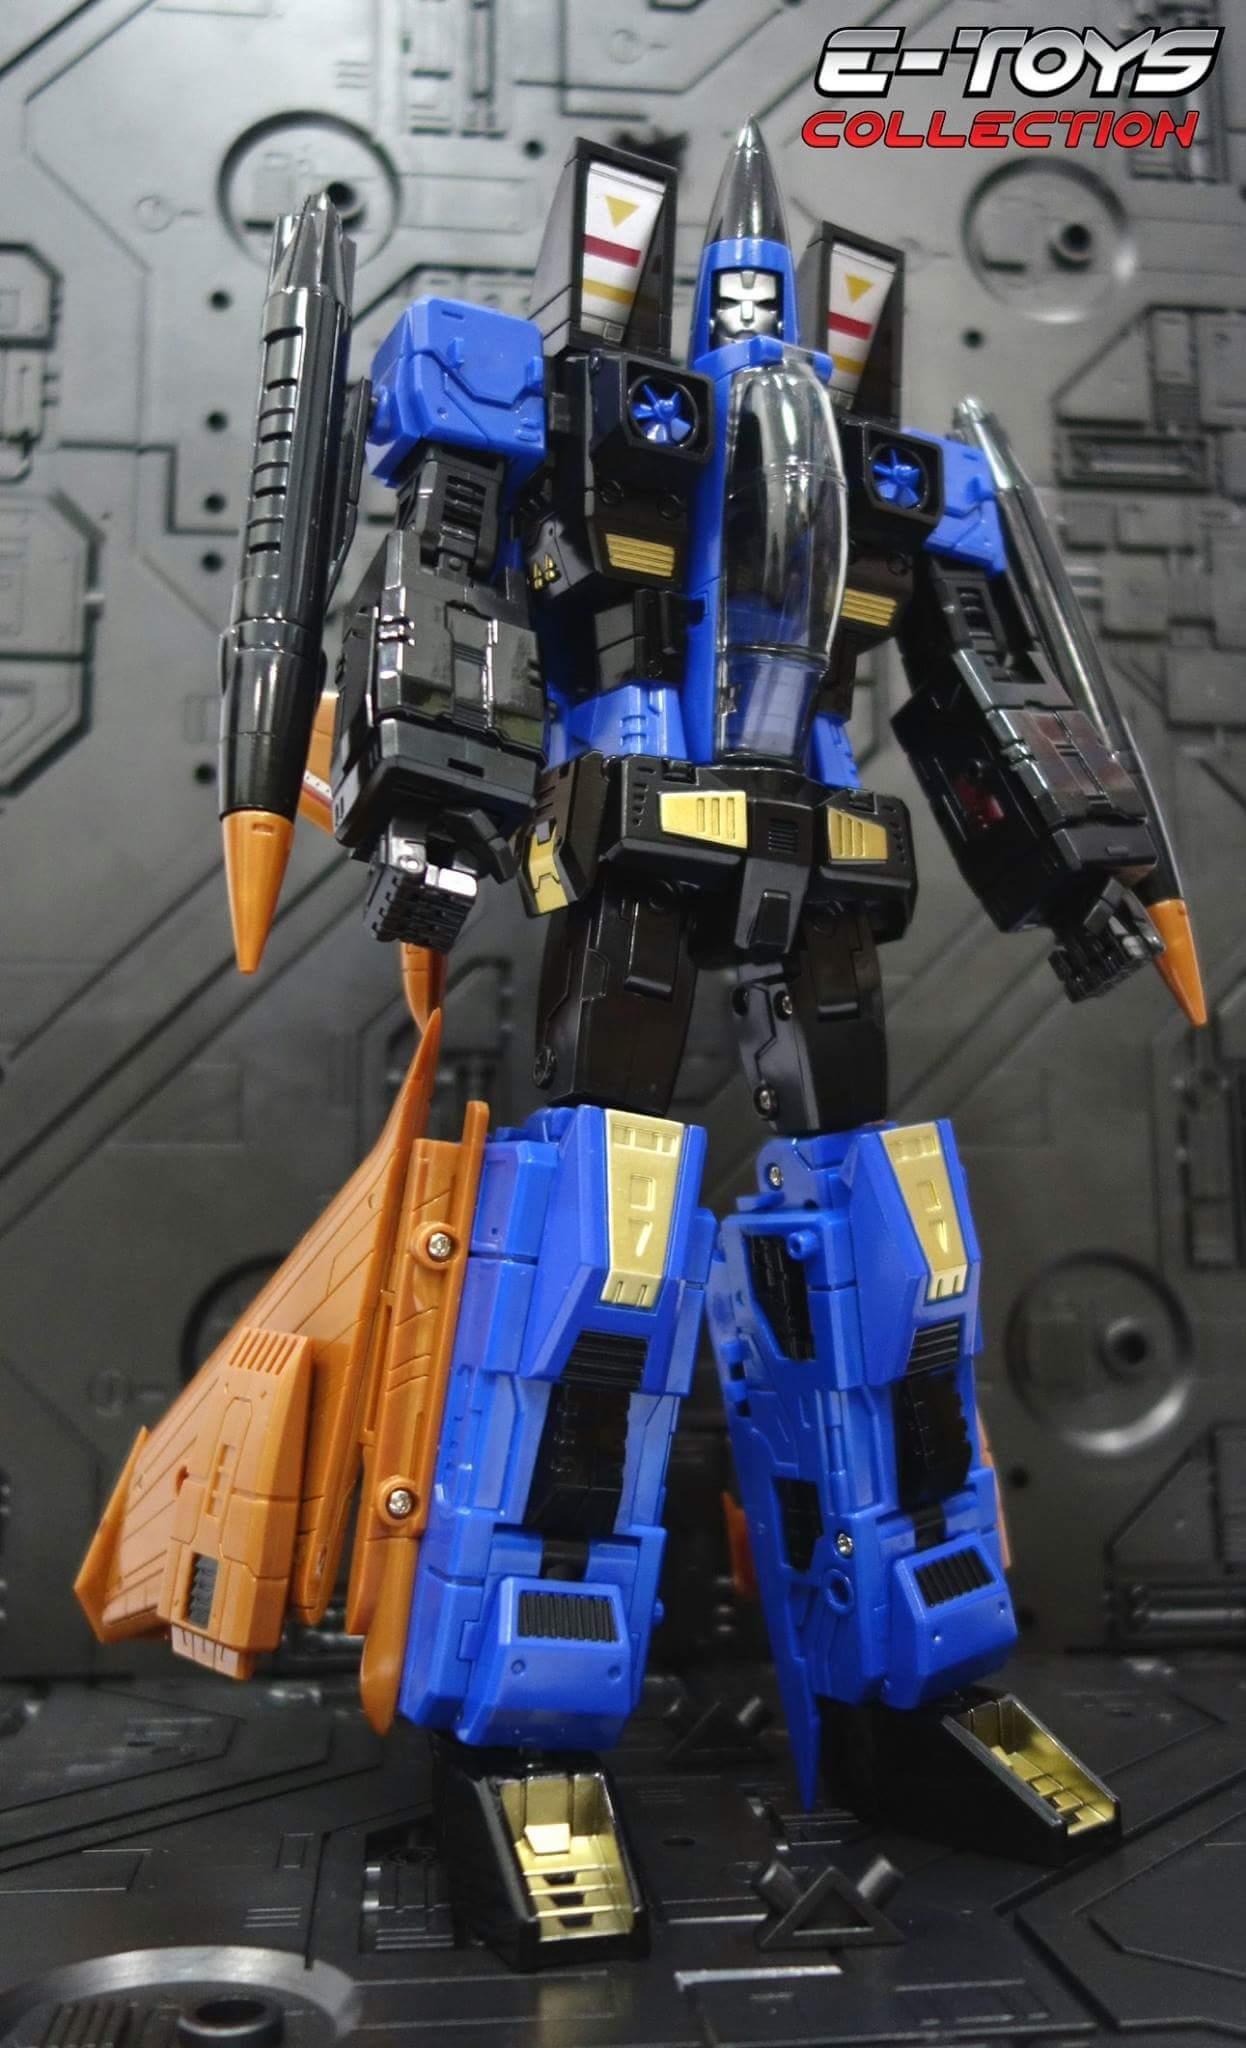 [ToyWorld] Produit Tiers - TW-M02A Combustor (Ramjet/Statoréacto), TW-M02B Assault (Thrust/Fatalo), TW-M02C Requiem (Dirge/Funébro) - Page 3 FgEKX0VI